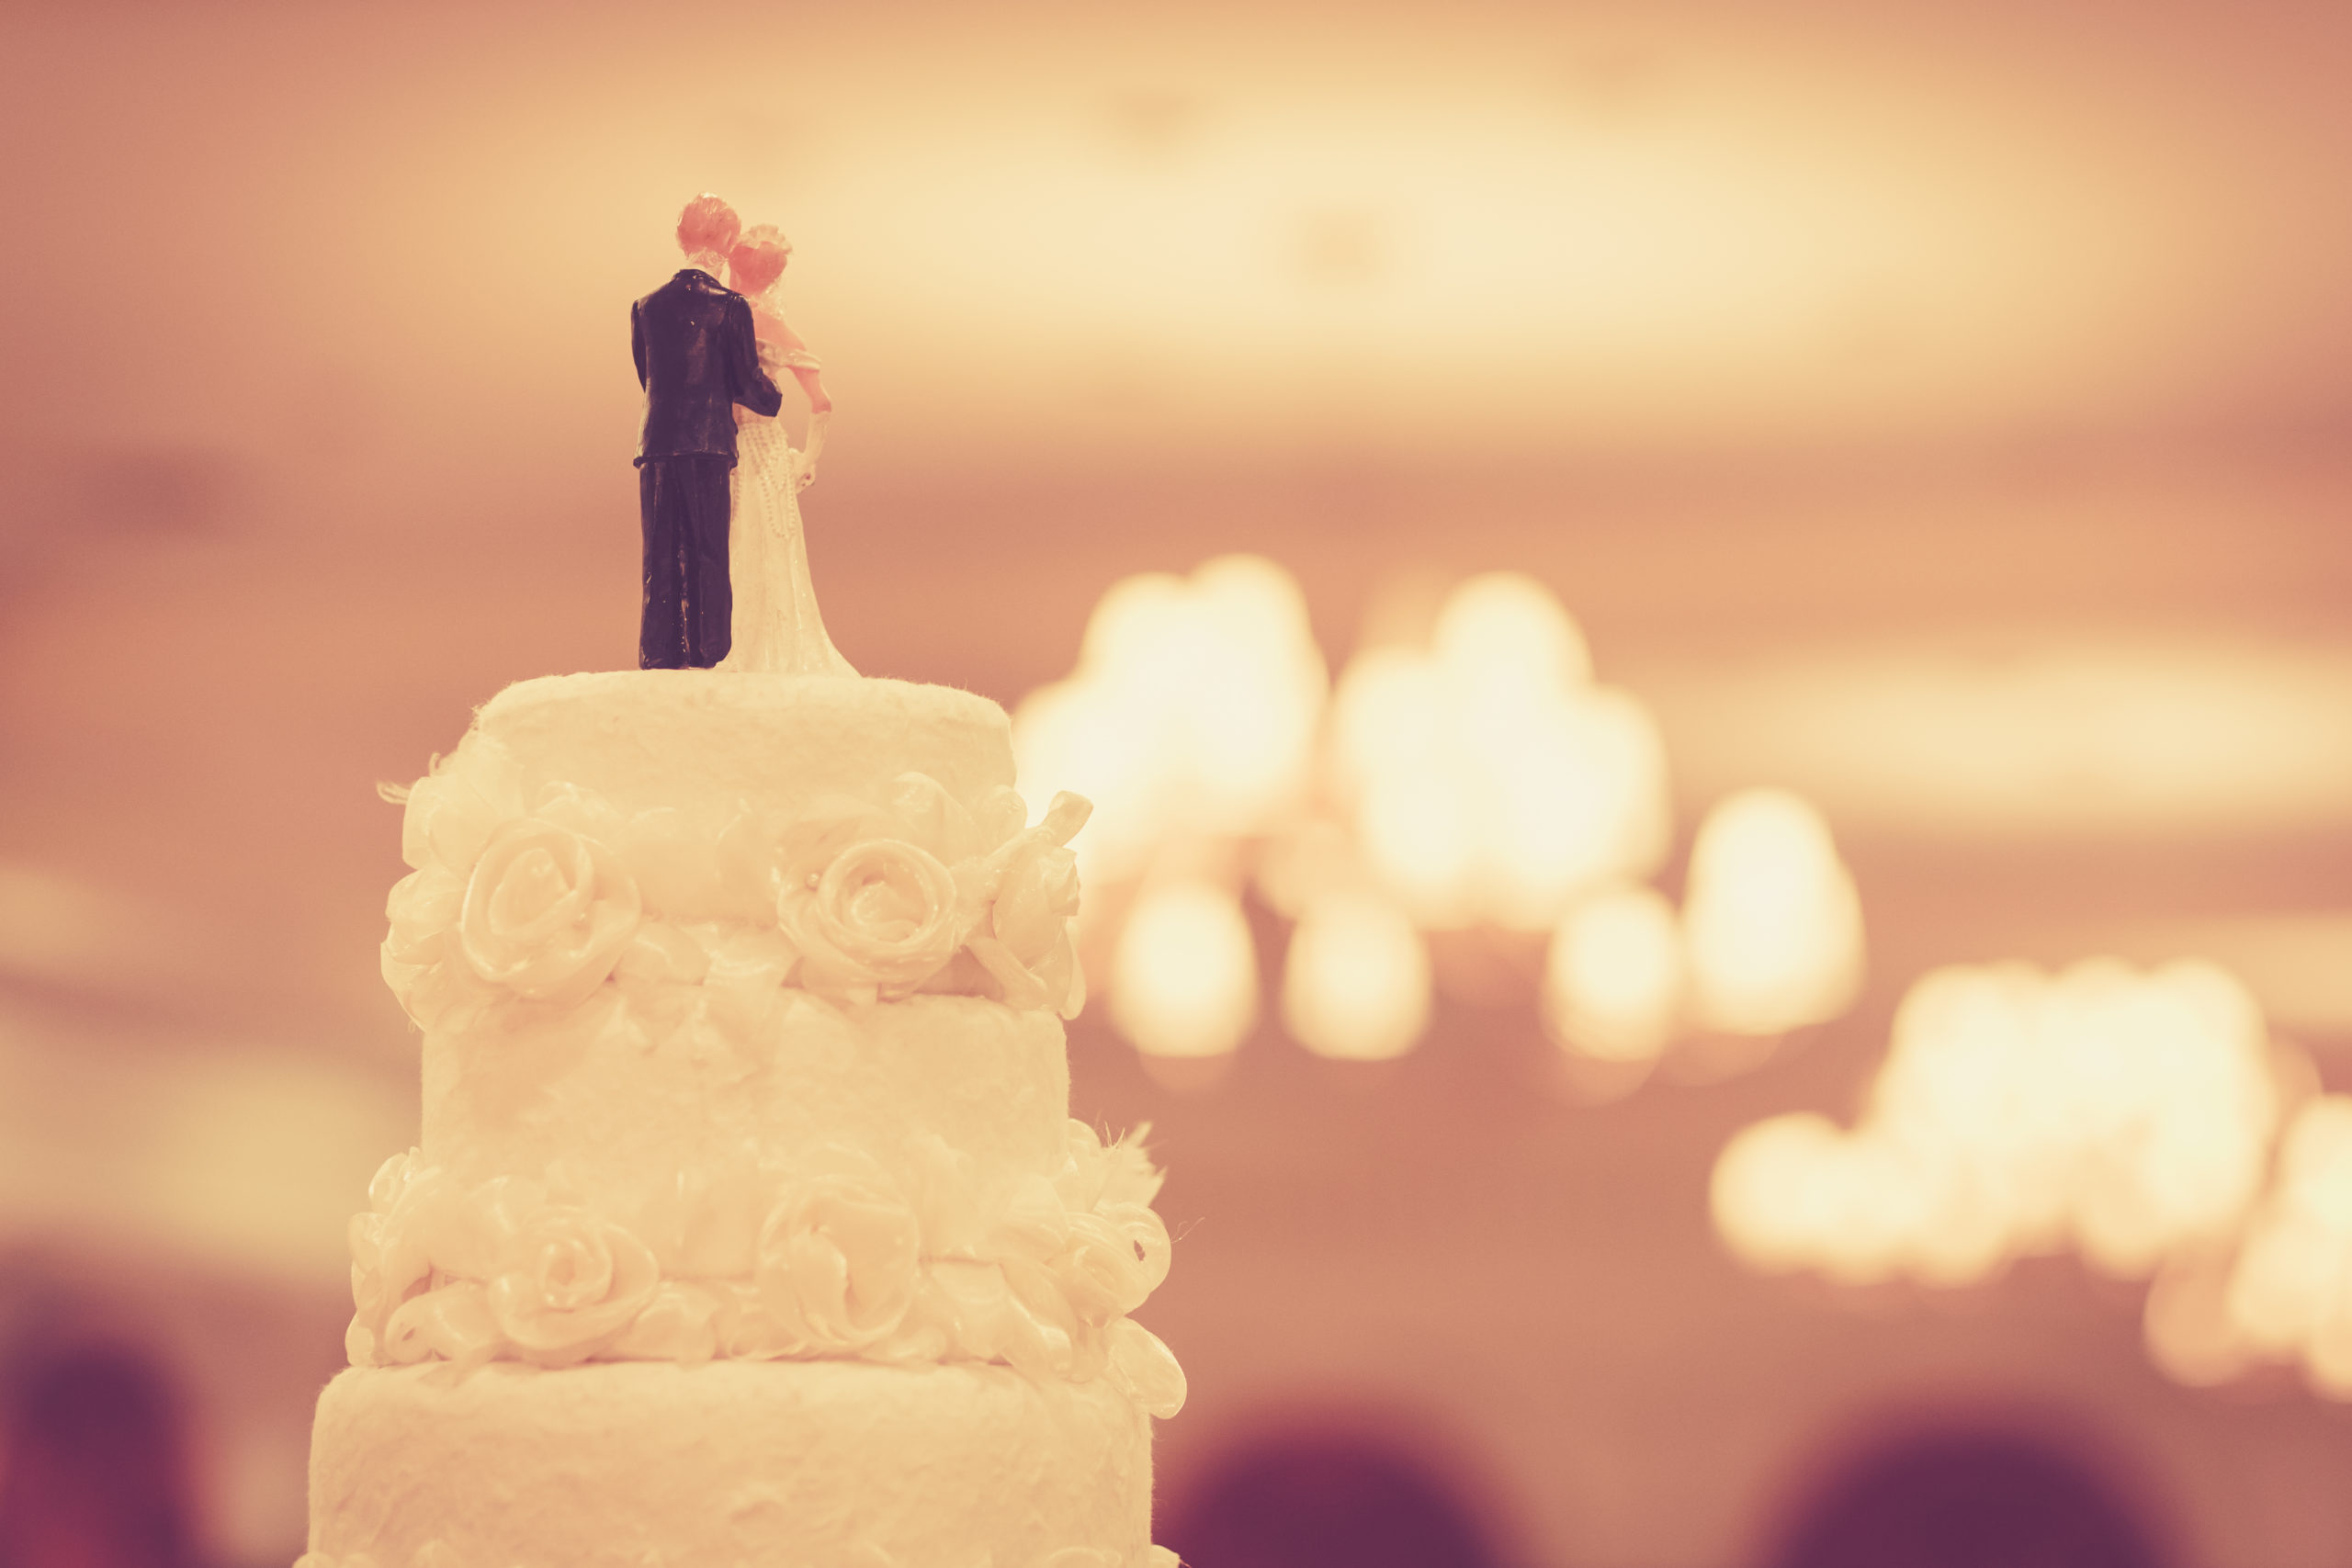 beautiful-cake-wedding-ceremony-211844305